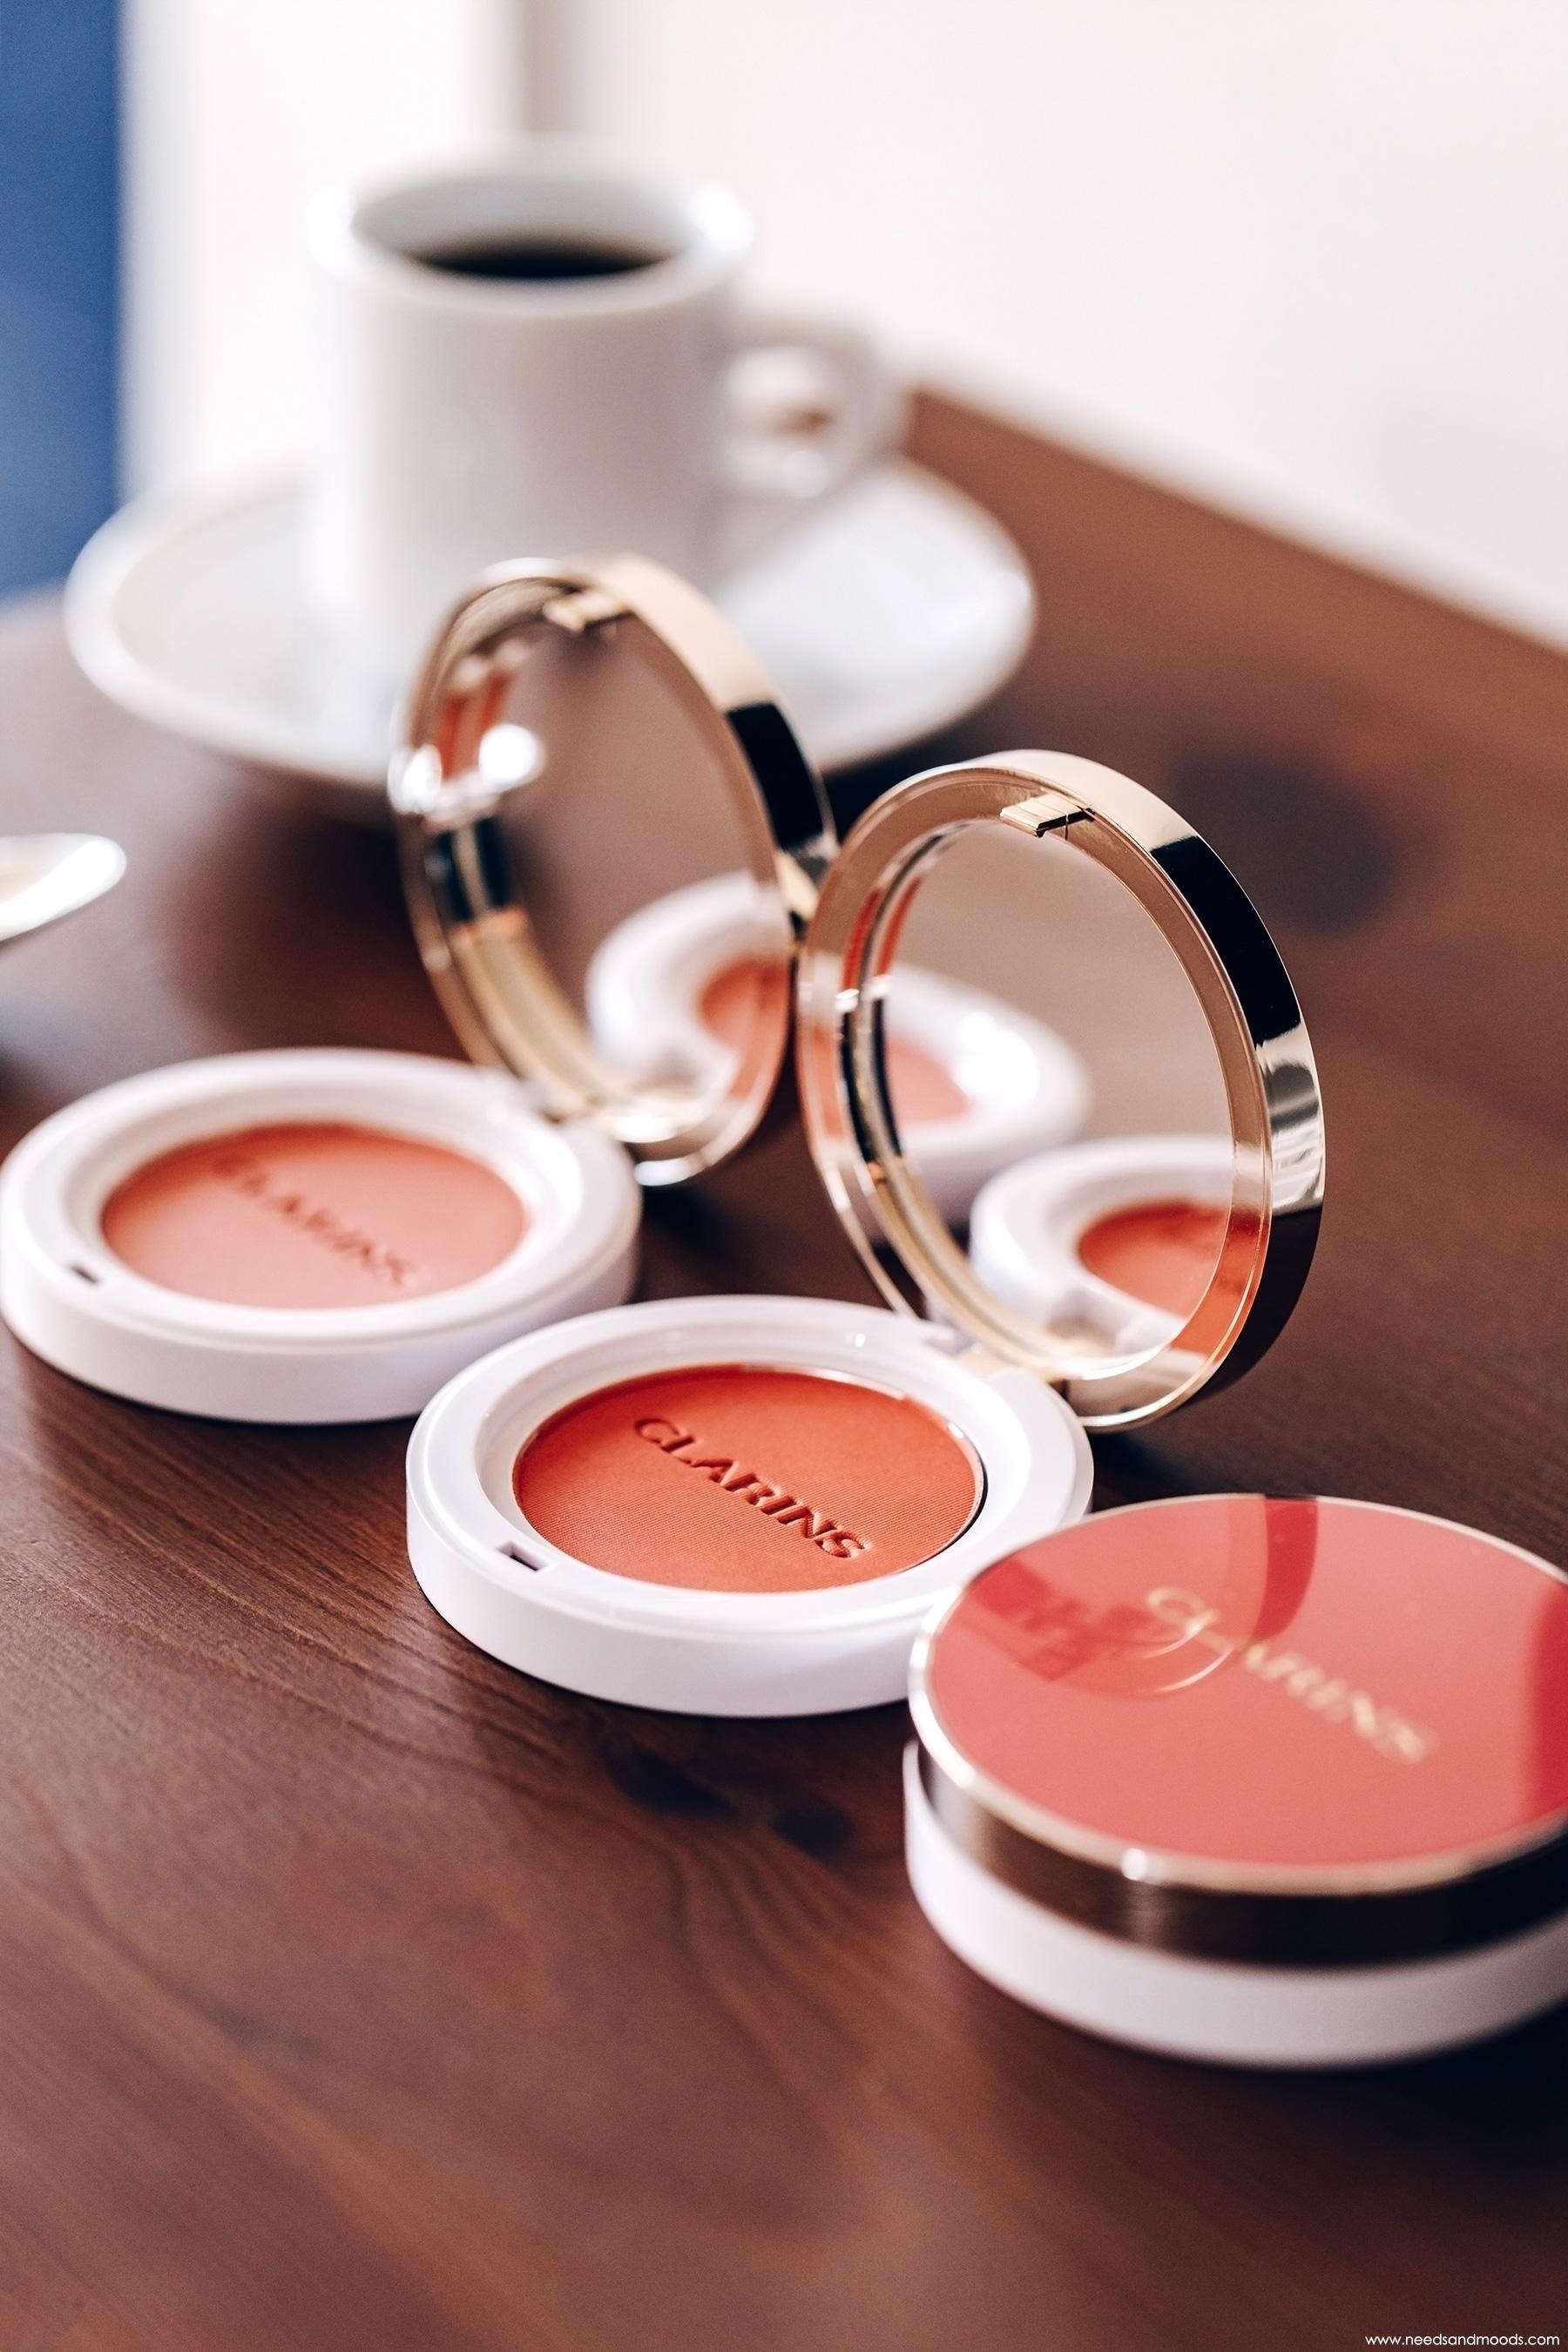 clarins joli blush 06 cheeky coral